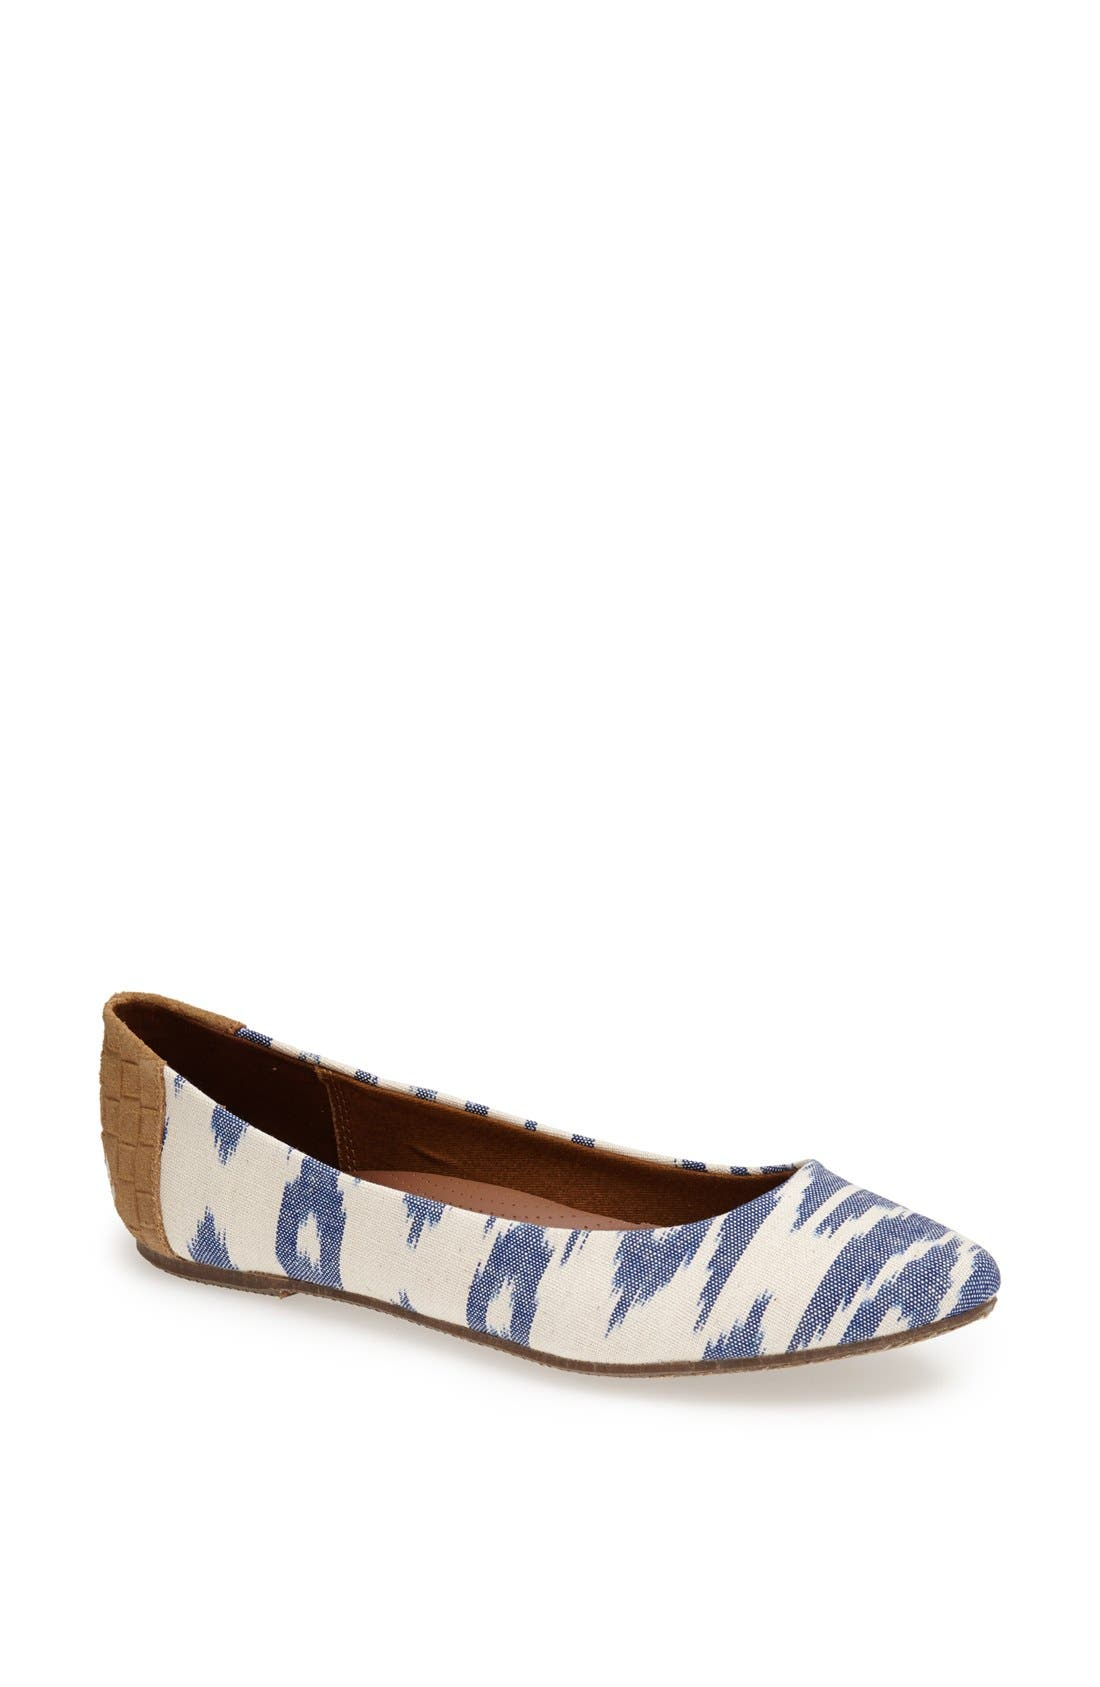 'Averlyn' Flat,                         Main,                         color, White/ Blue